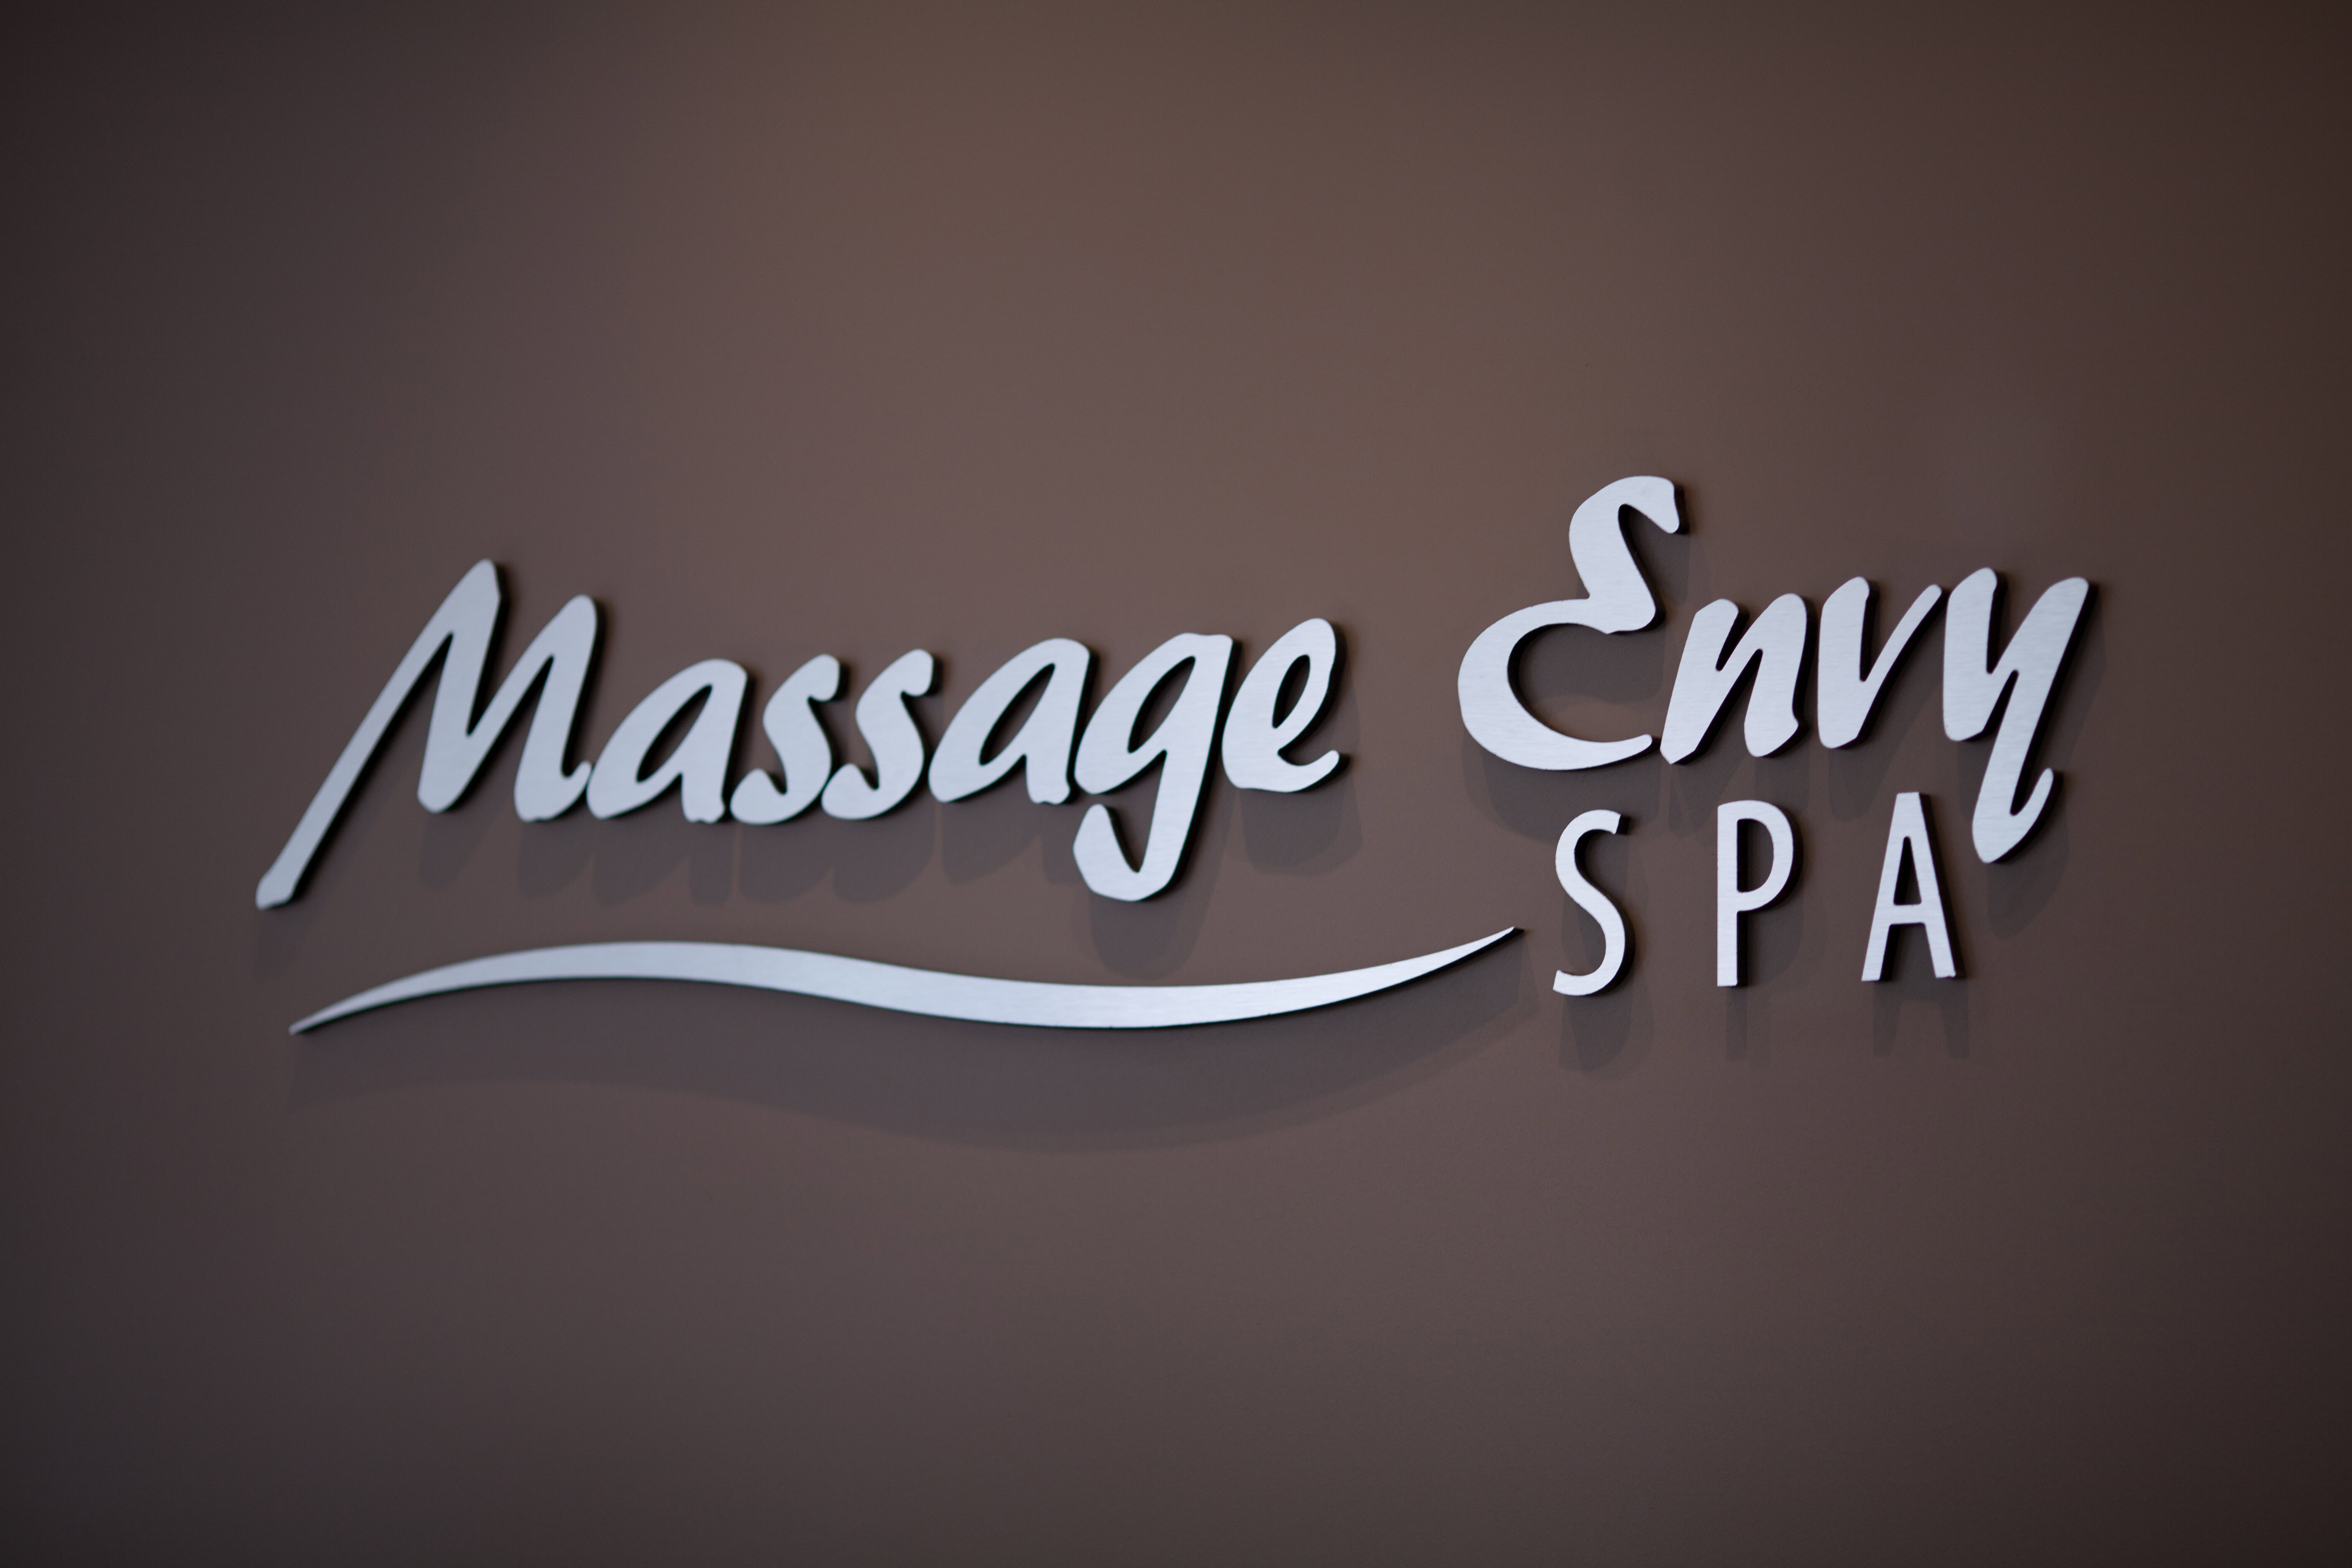 Massage Envy Spa - Bel Air